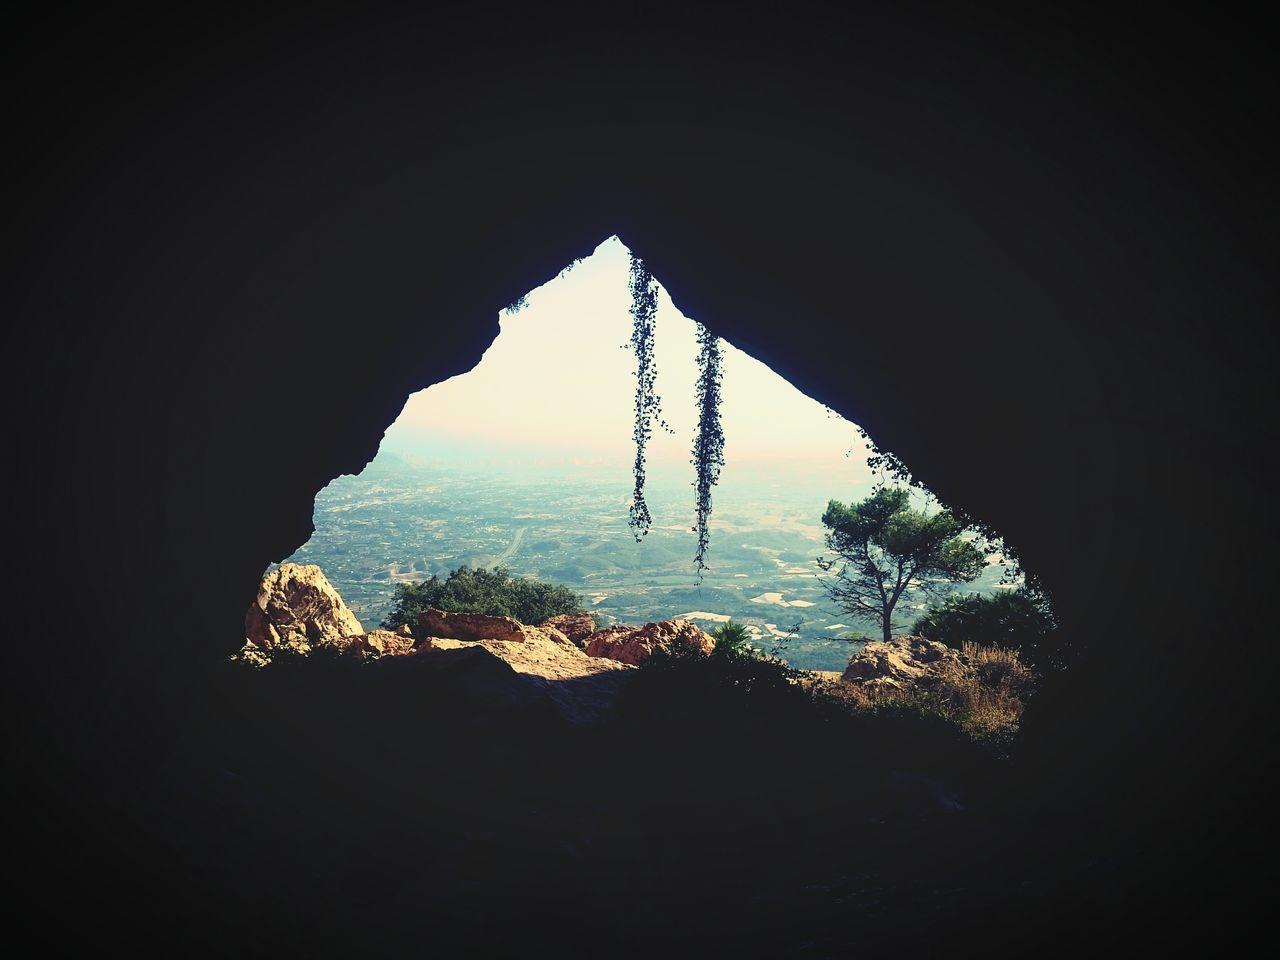 Hidden Gems  Foratdealtea Hole In The Wall Cave Bernia Altea Benidorm Landscape EyeEm Nature Lover Peaceful Landscape_photography Sony Xperia Z2 Sony Xperia Photography. Mobile Photography